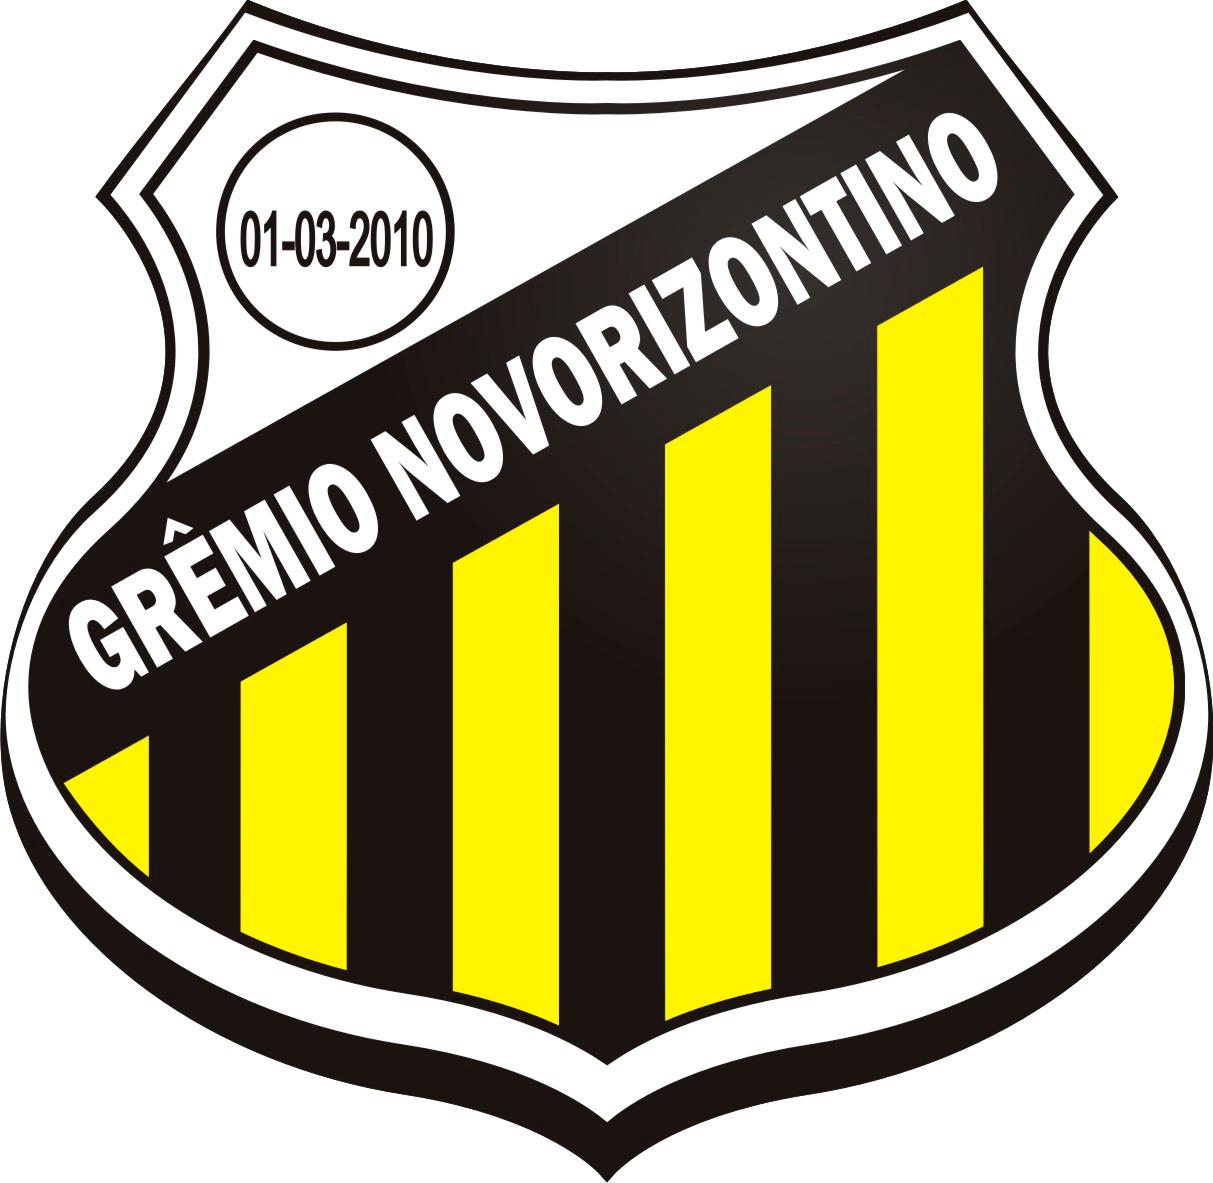 Gremio Novorizontino Gremio Novorizontino Futebol Kits De Futebol